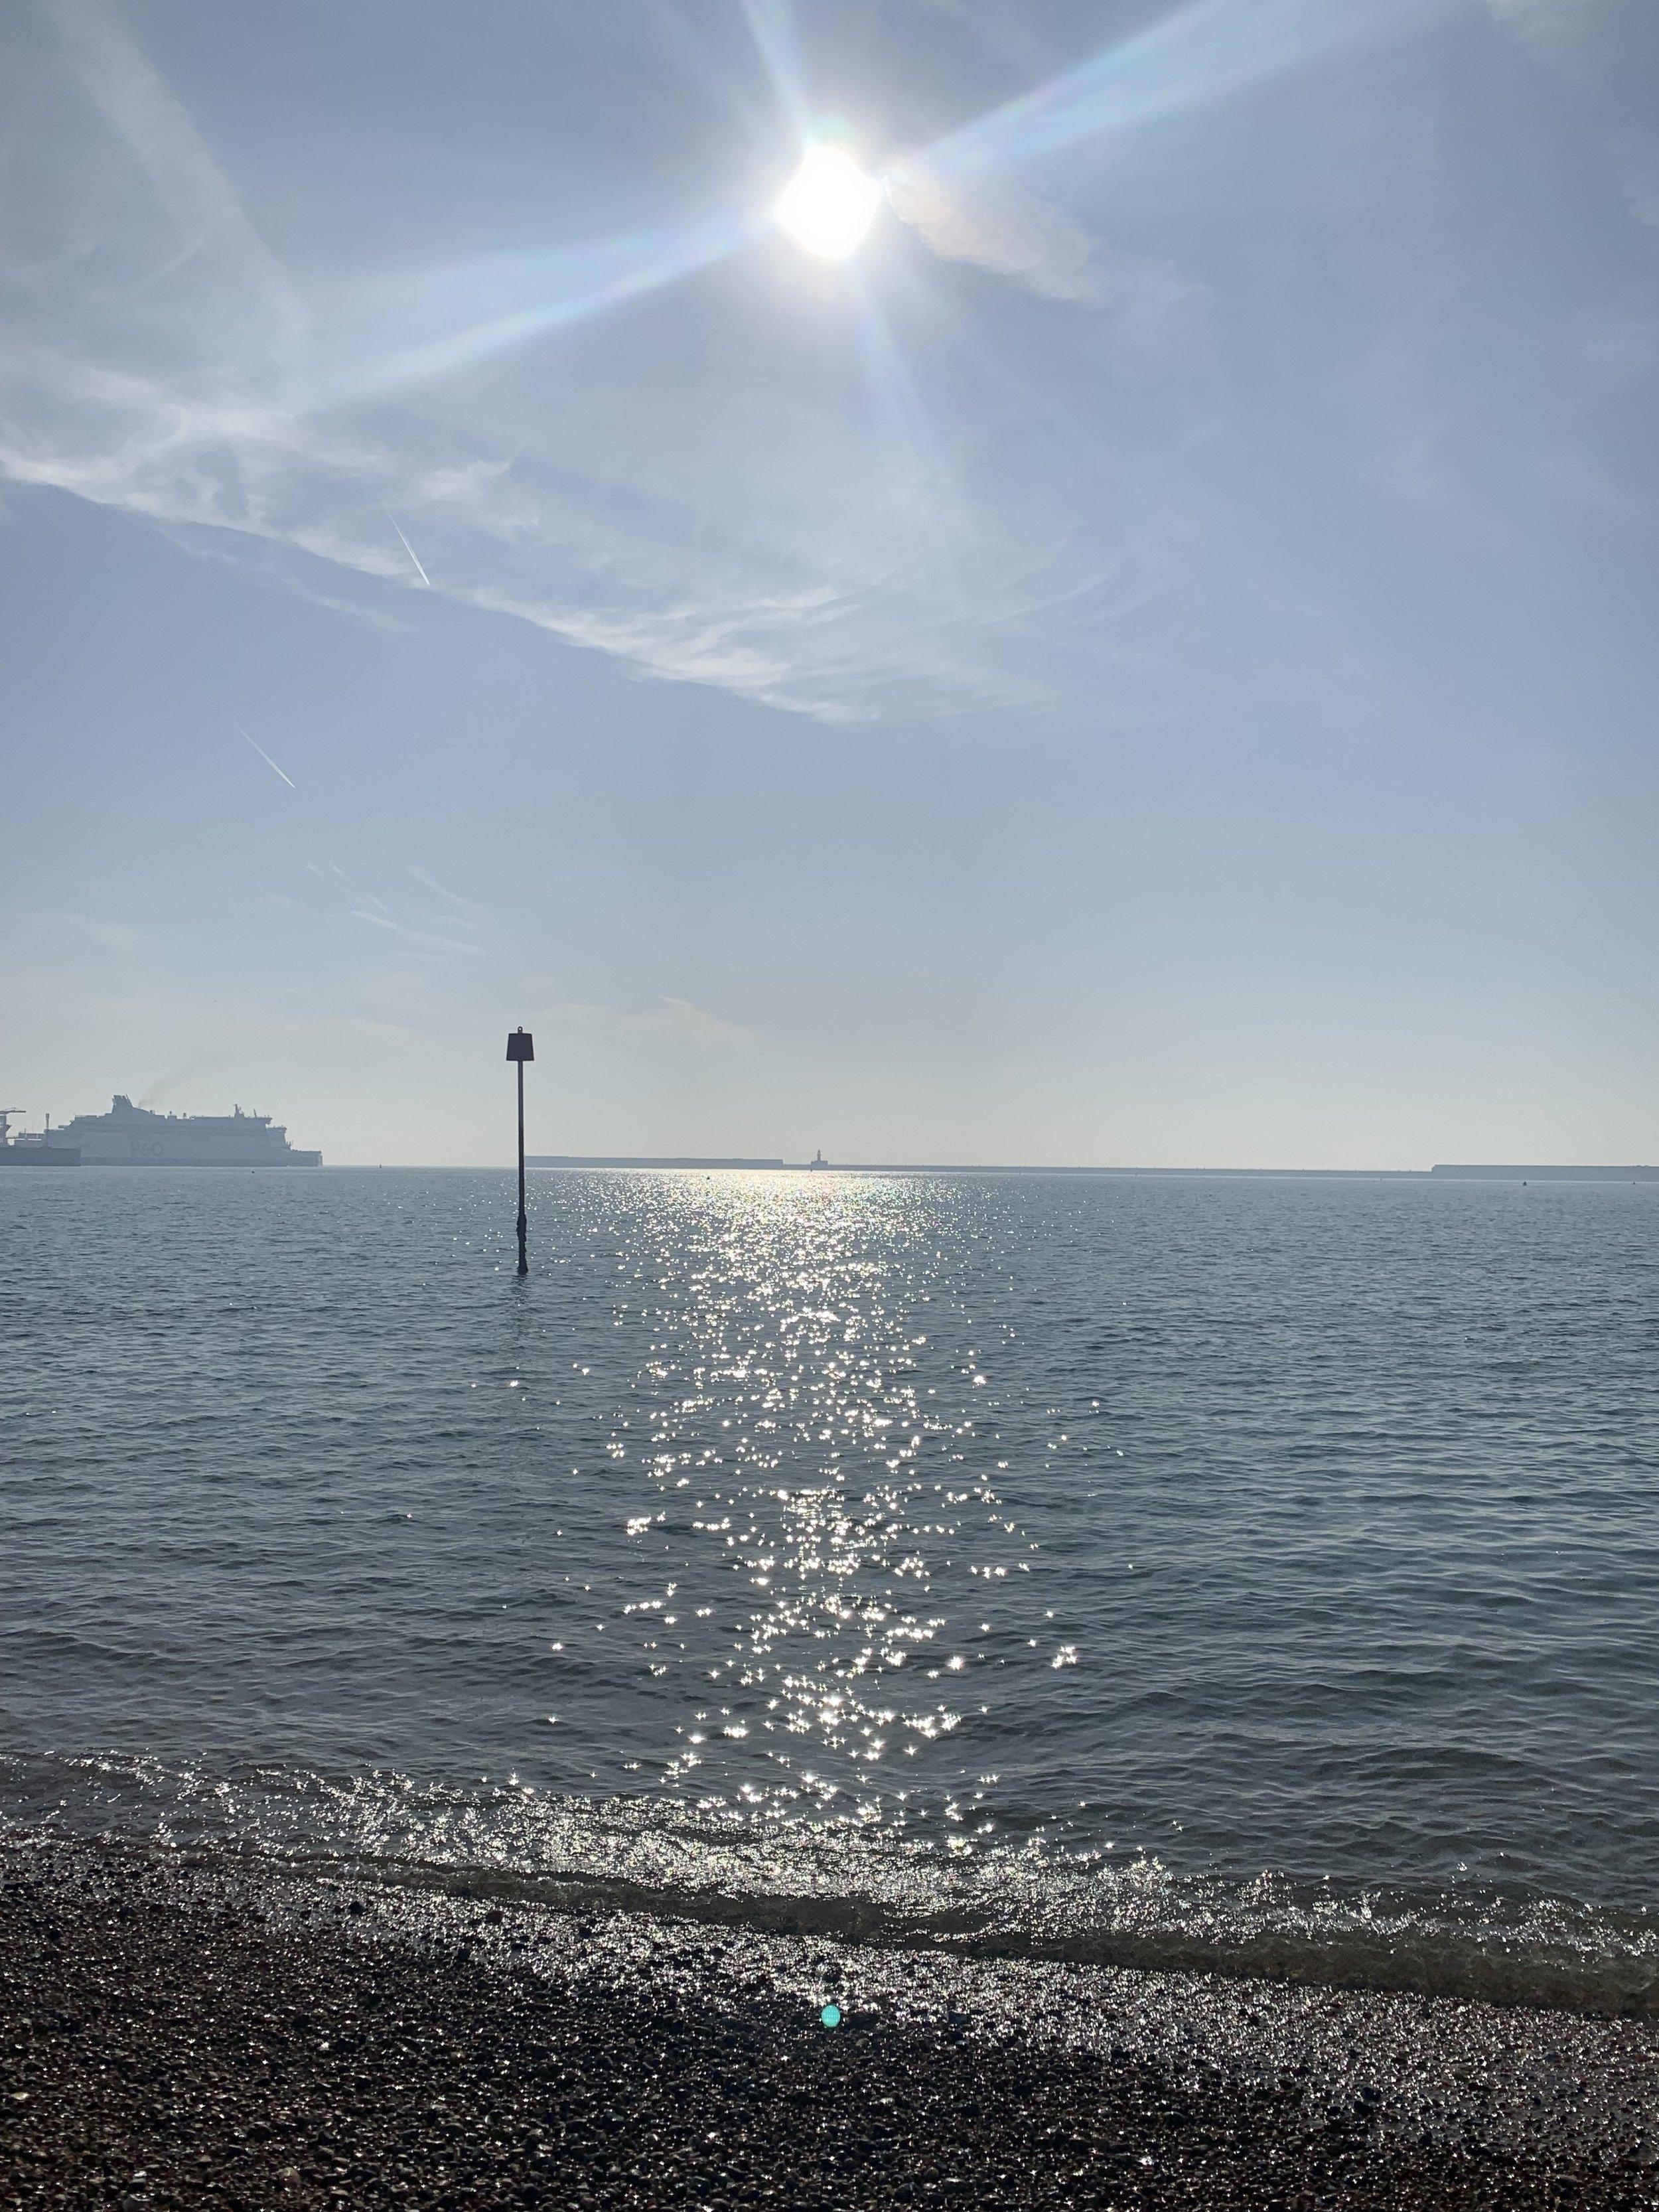 Daylight on Saturday